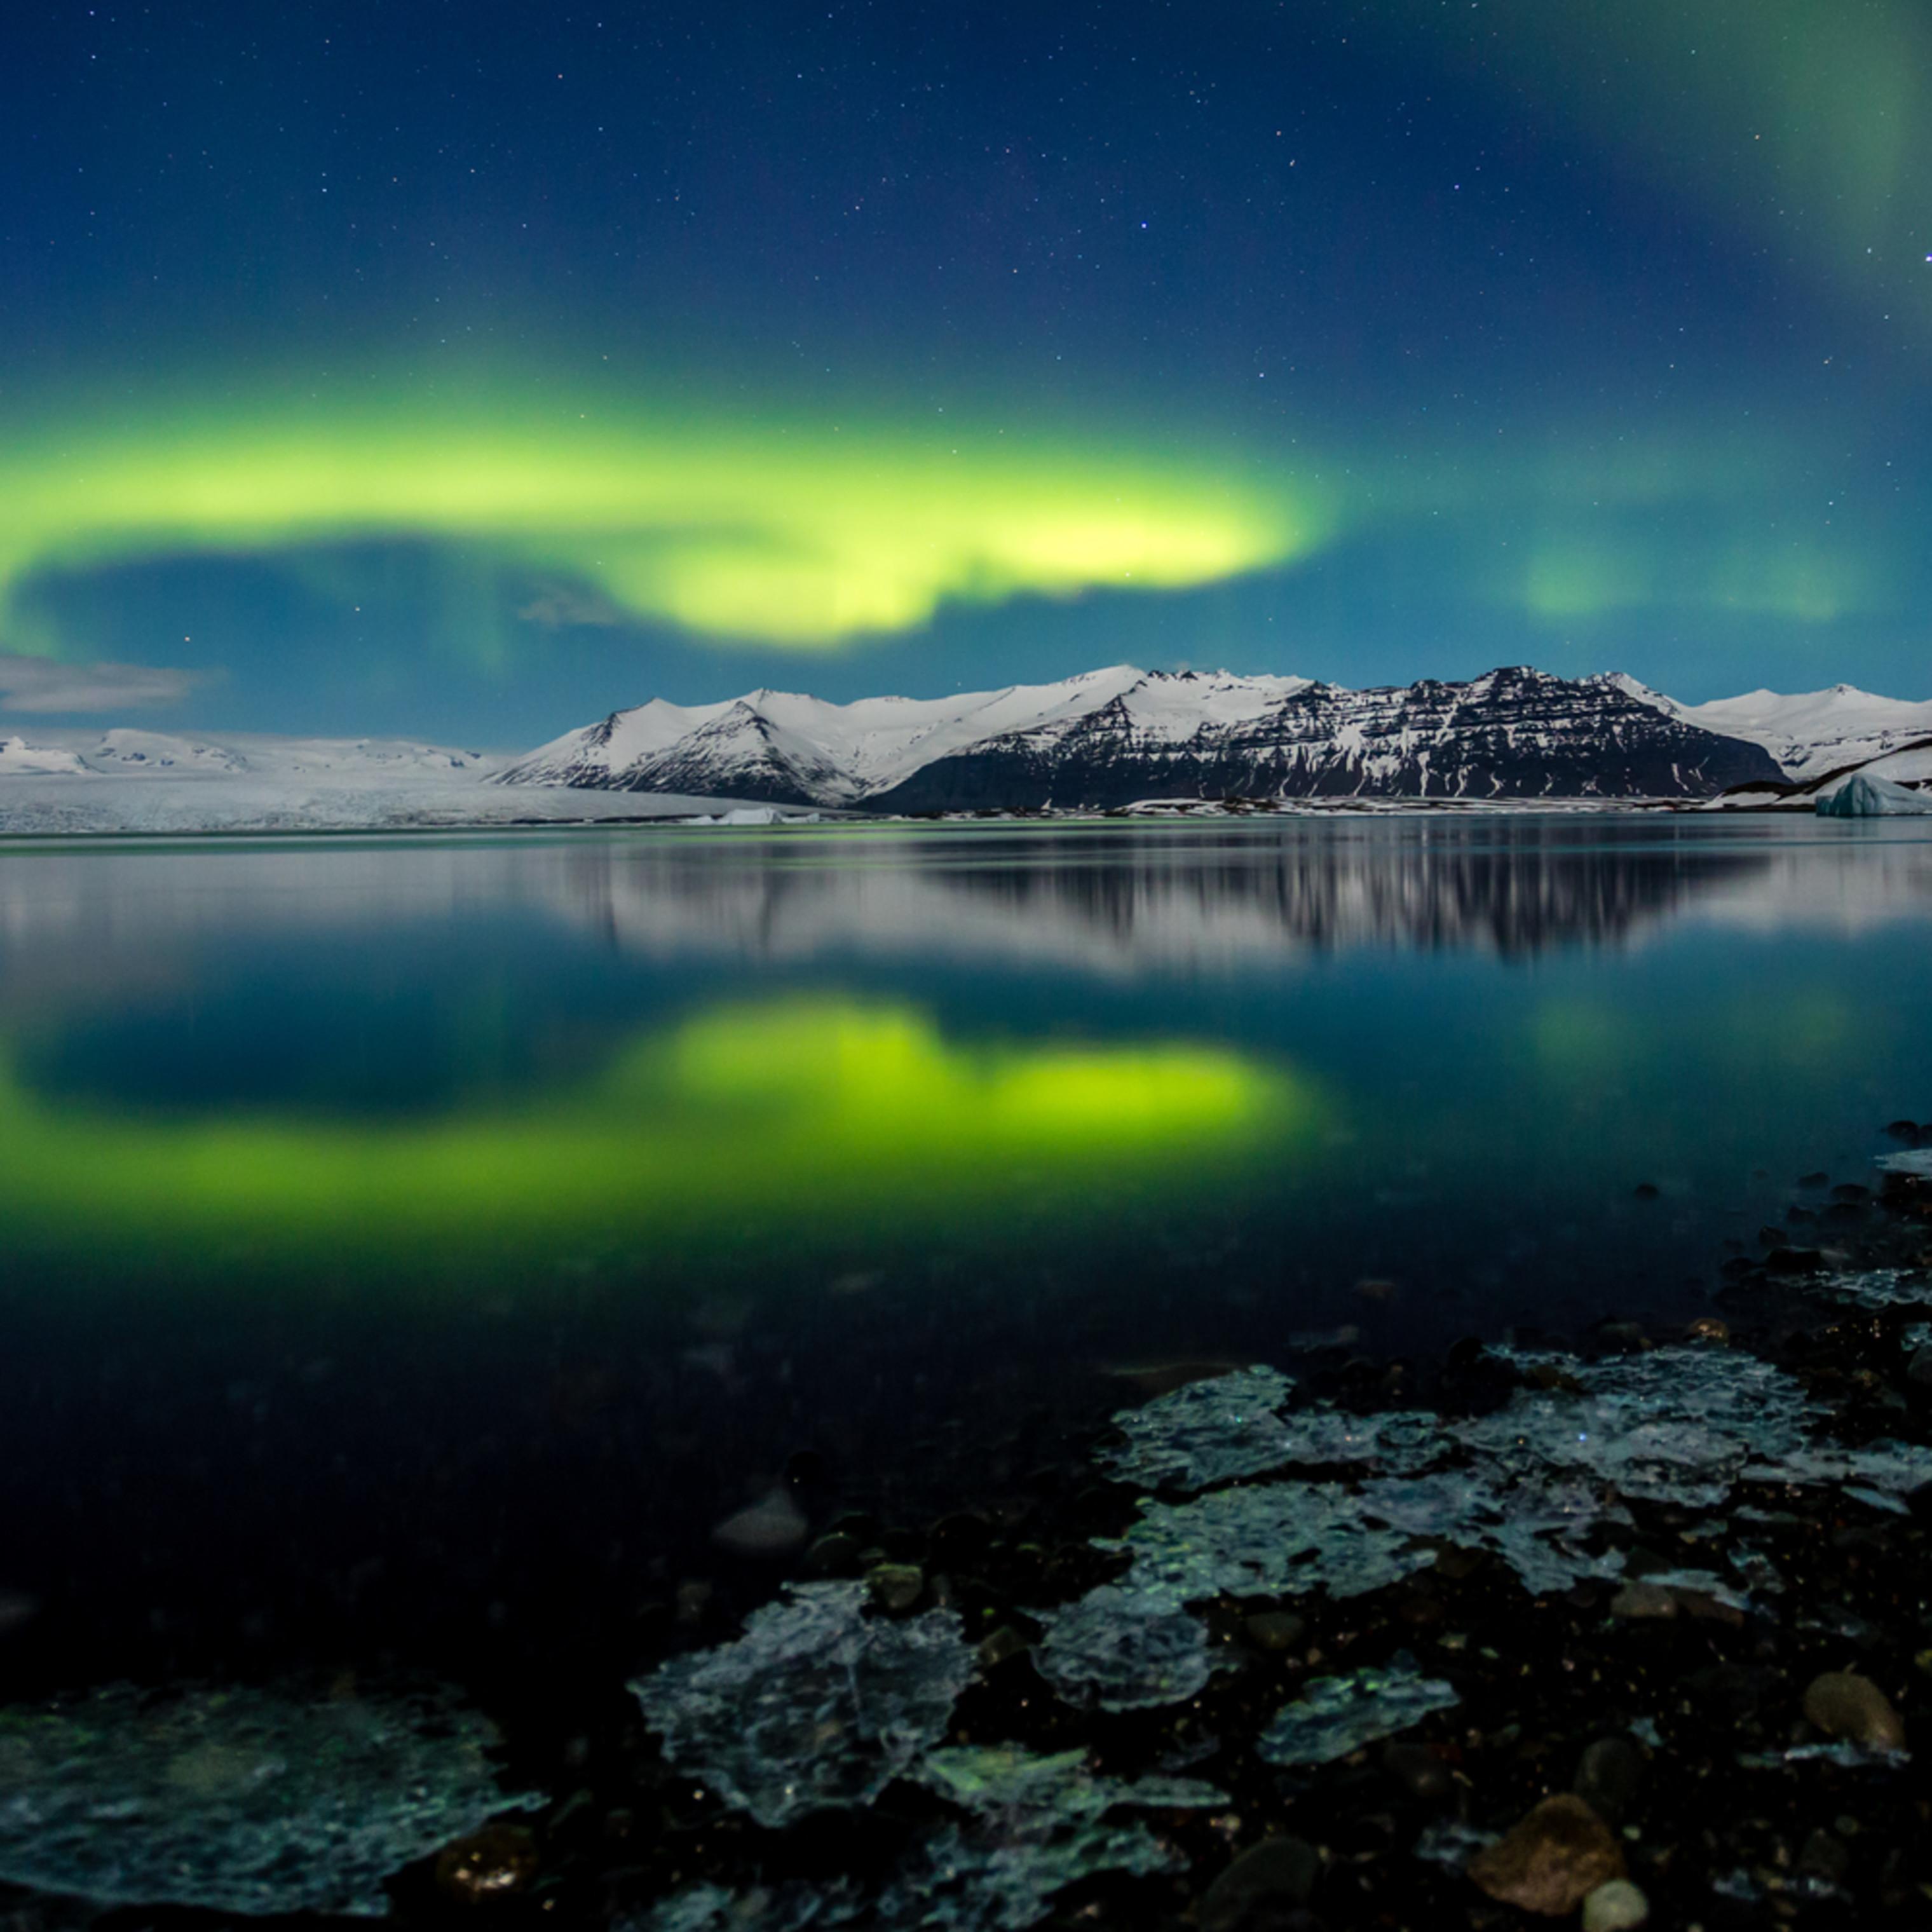 Northern lights 3 5 5066 3040 3 kj9qrg